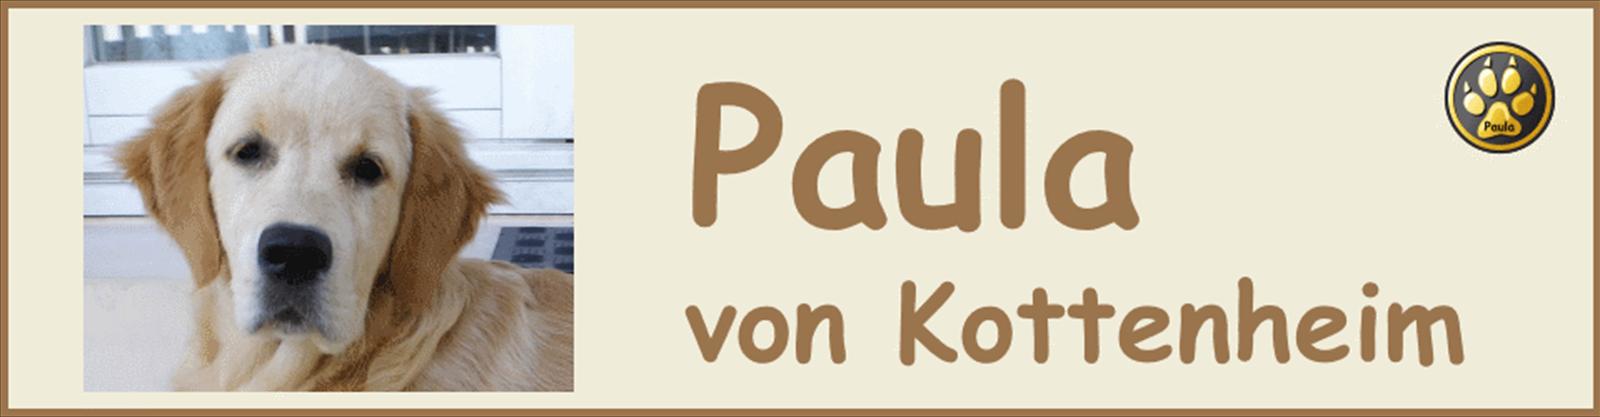 Paula-Banner-04